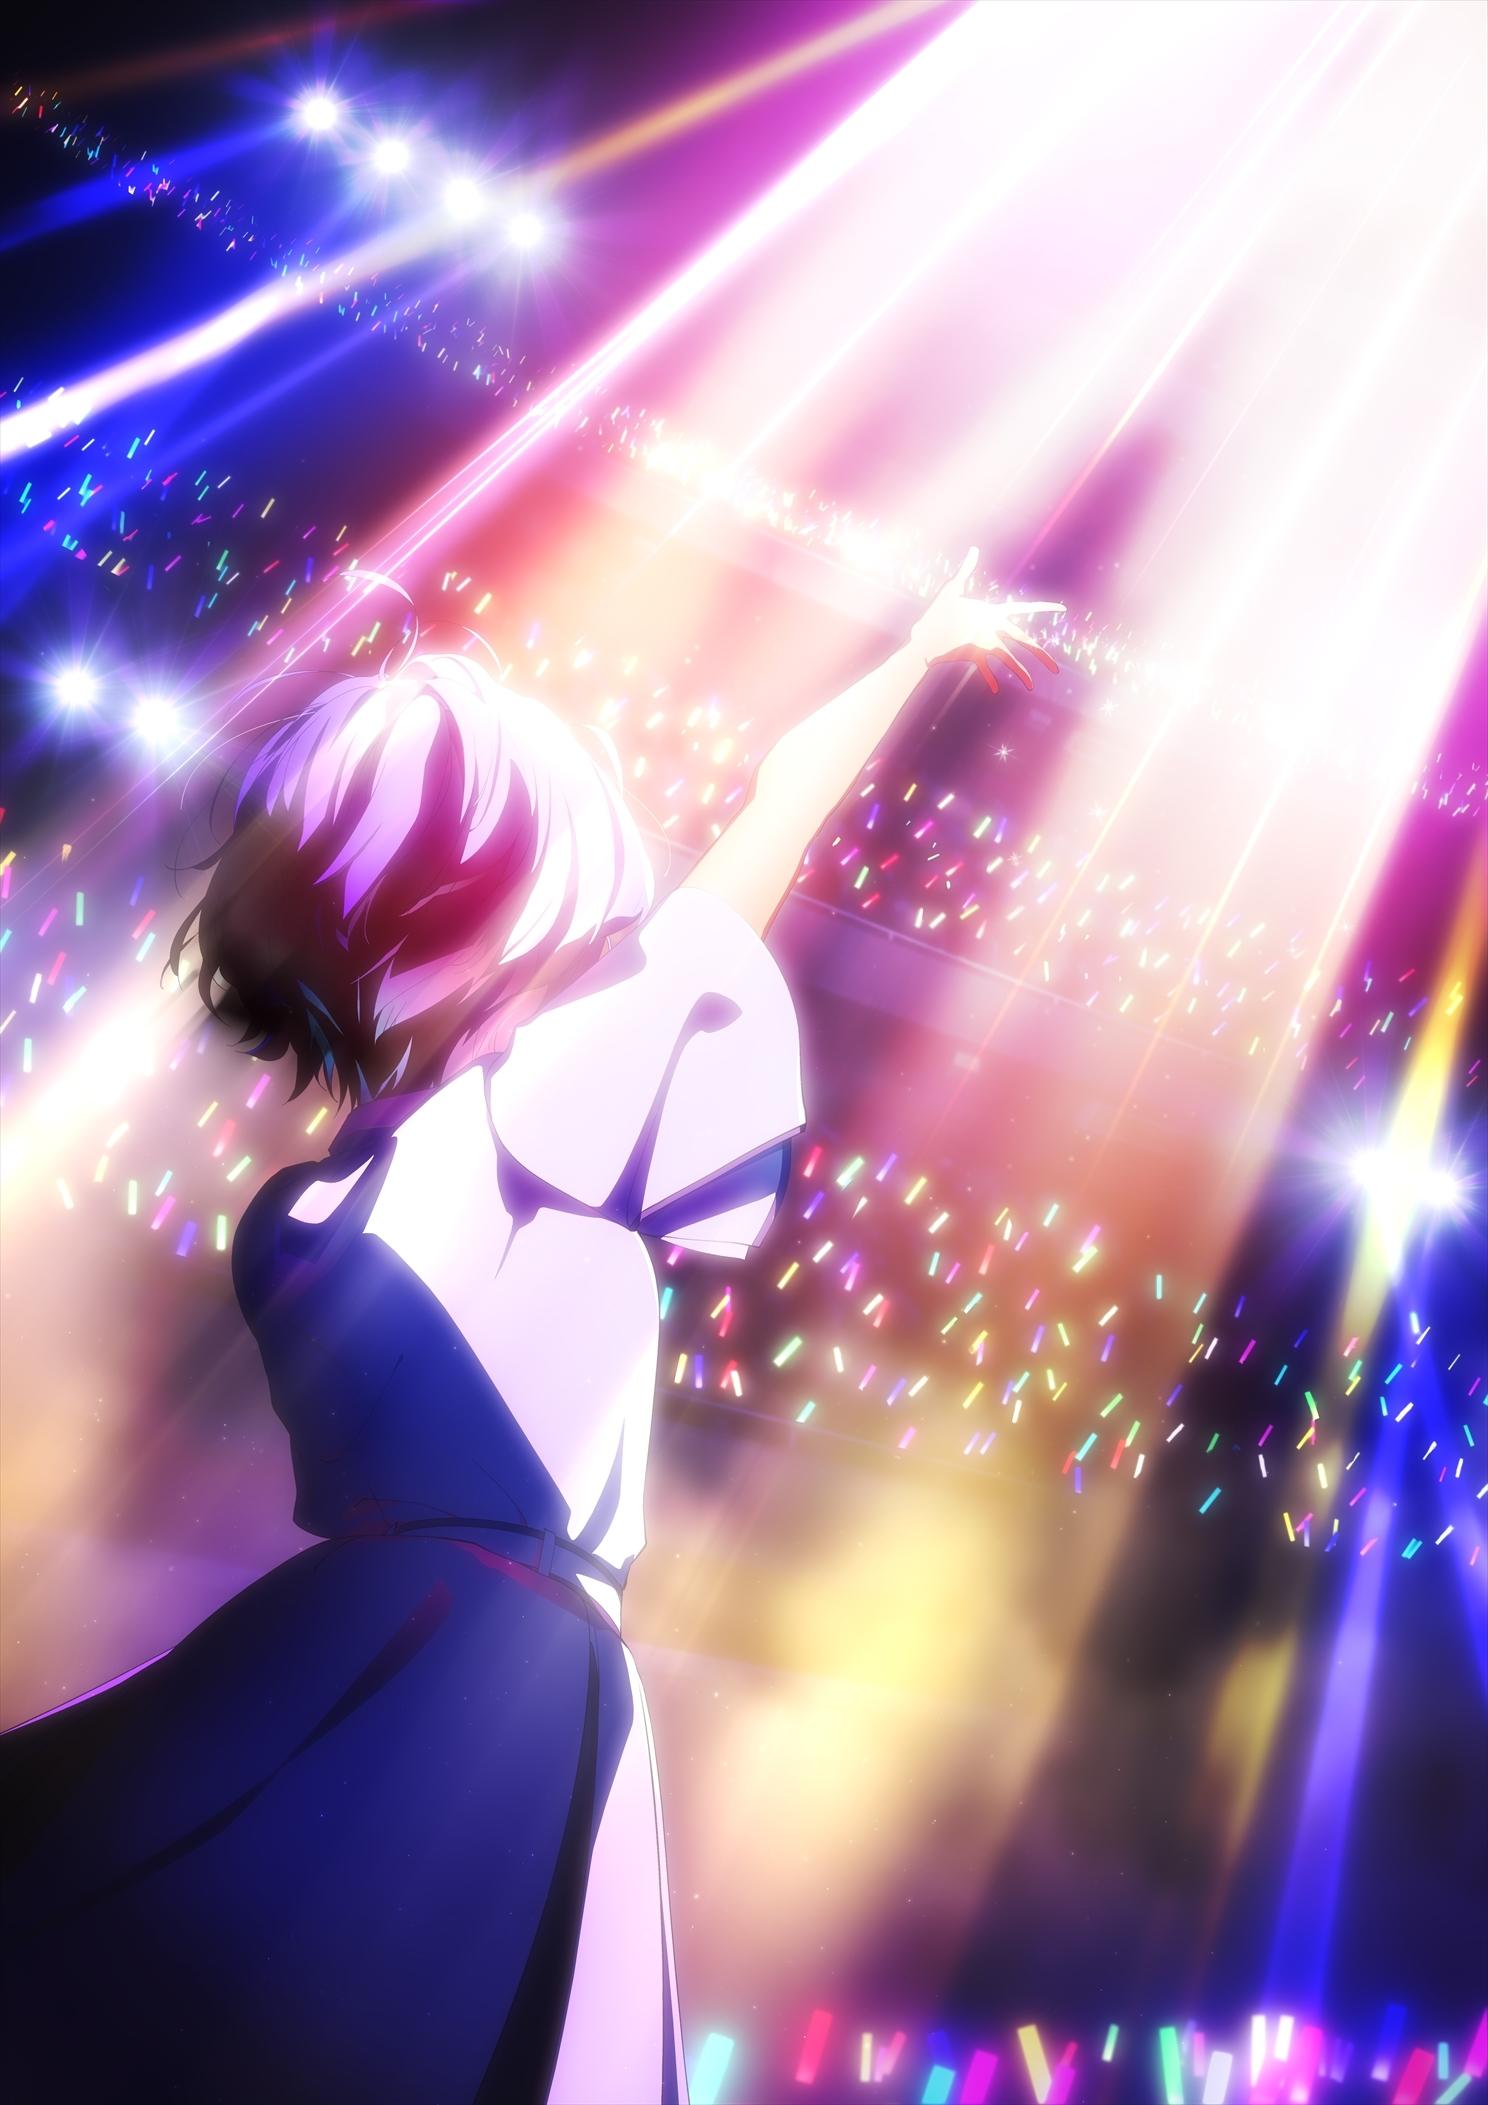 TVアニメ『22/7』ティザービジュアル (C)ANIME 22/7